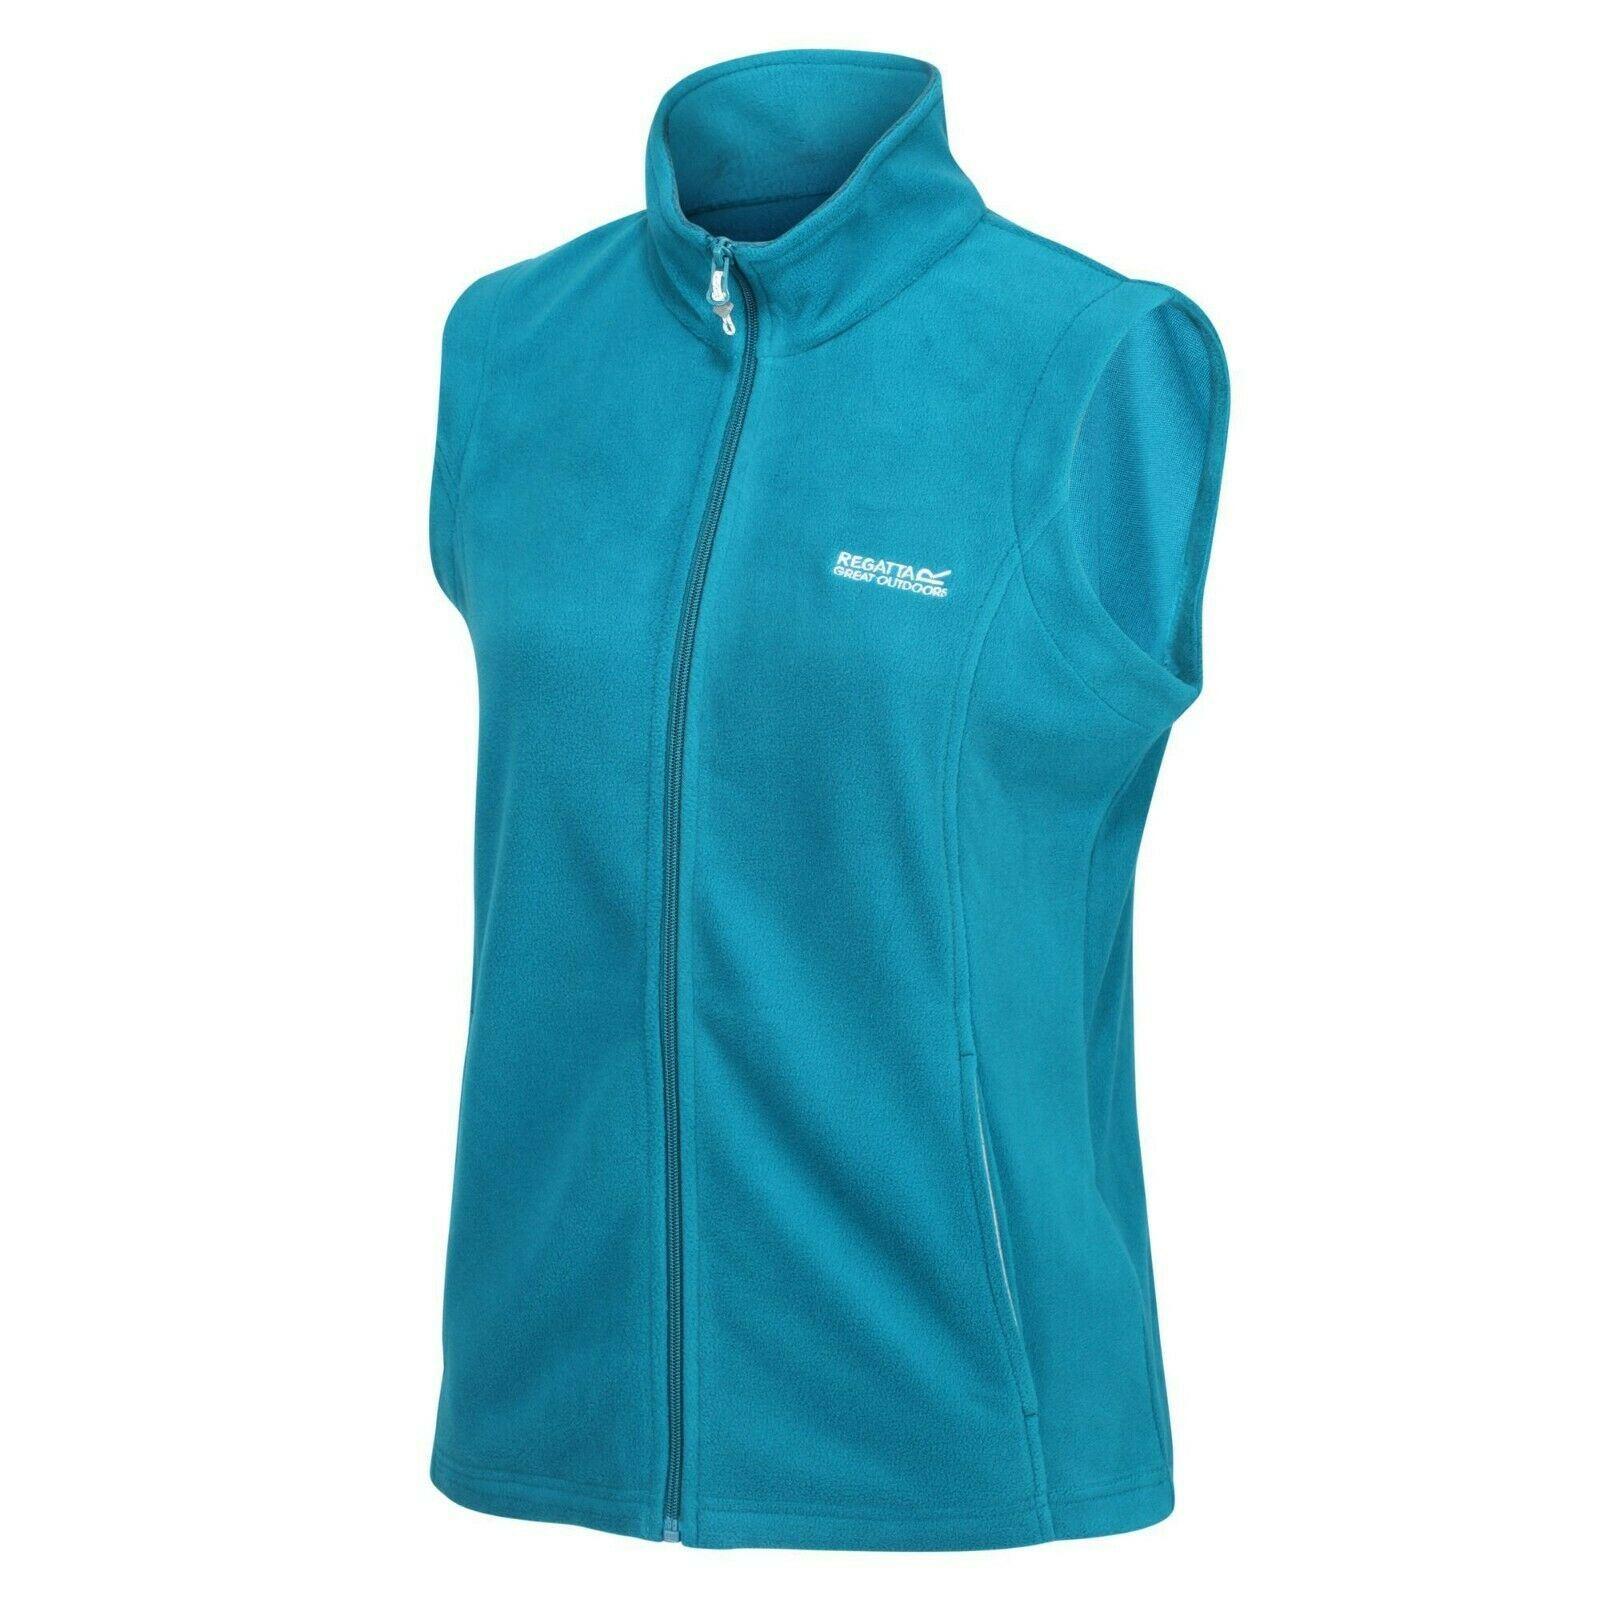 miniatuur 17 - Regatta Womens Sweetness Full Zip Micro Fleece Casual Bodywarmer Waistcoat